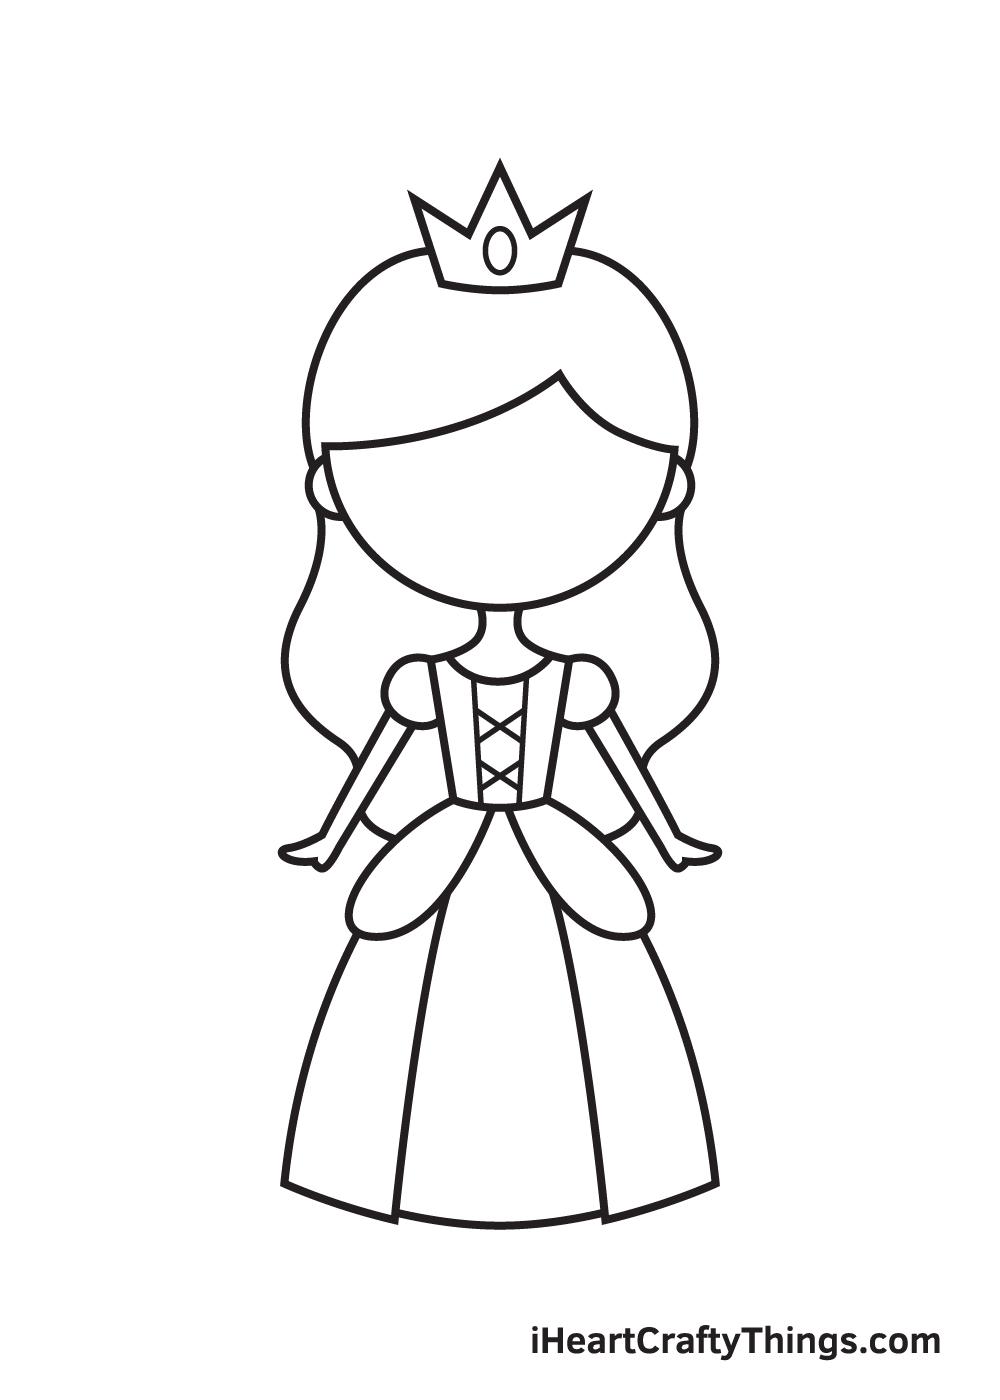 Princess Drawing – Step 8